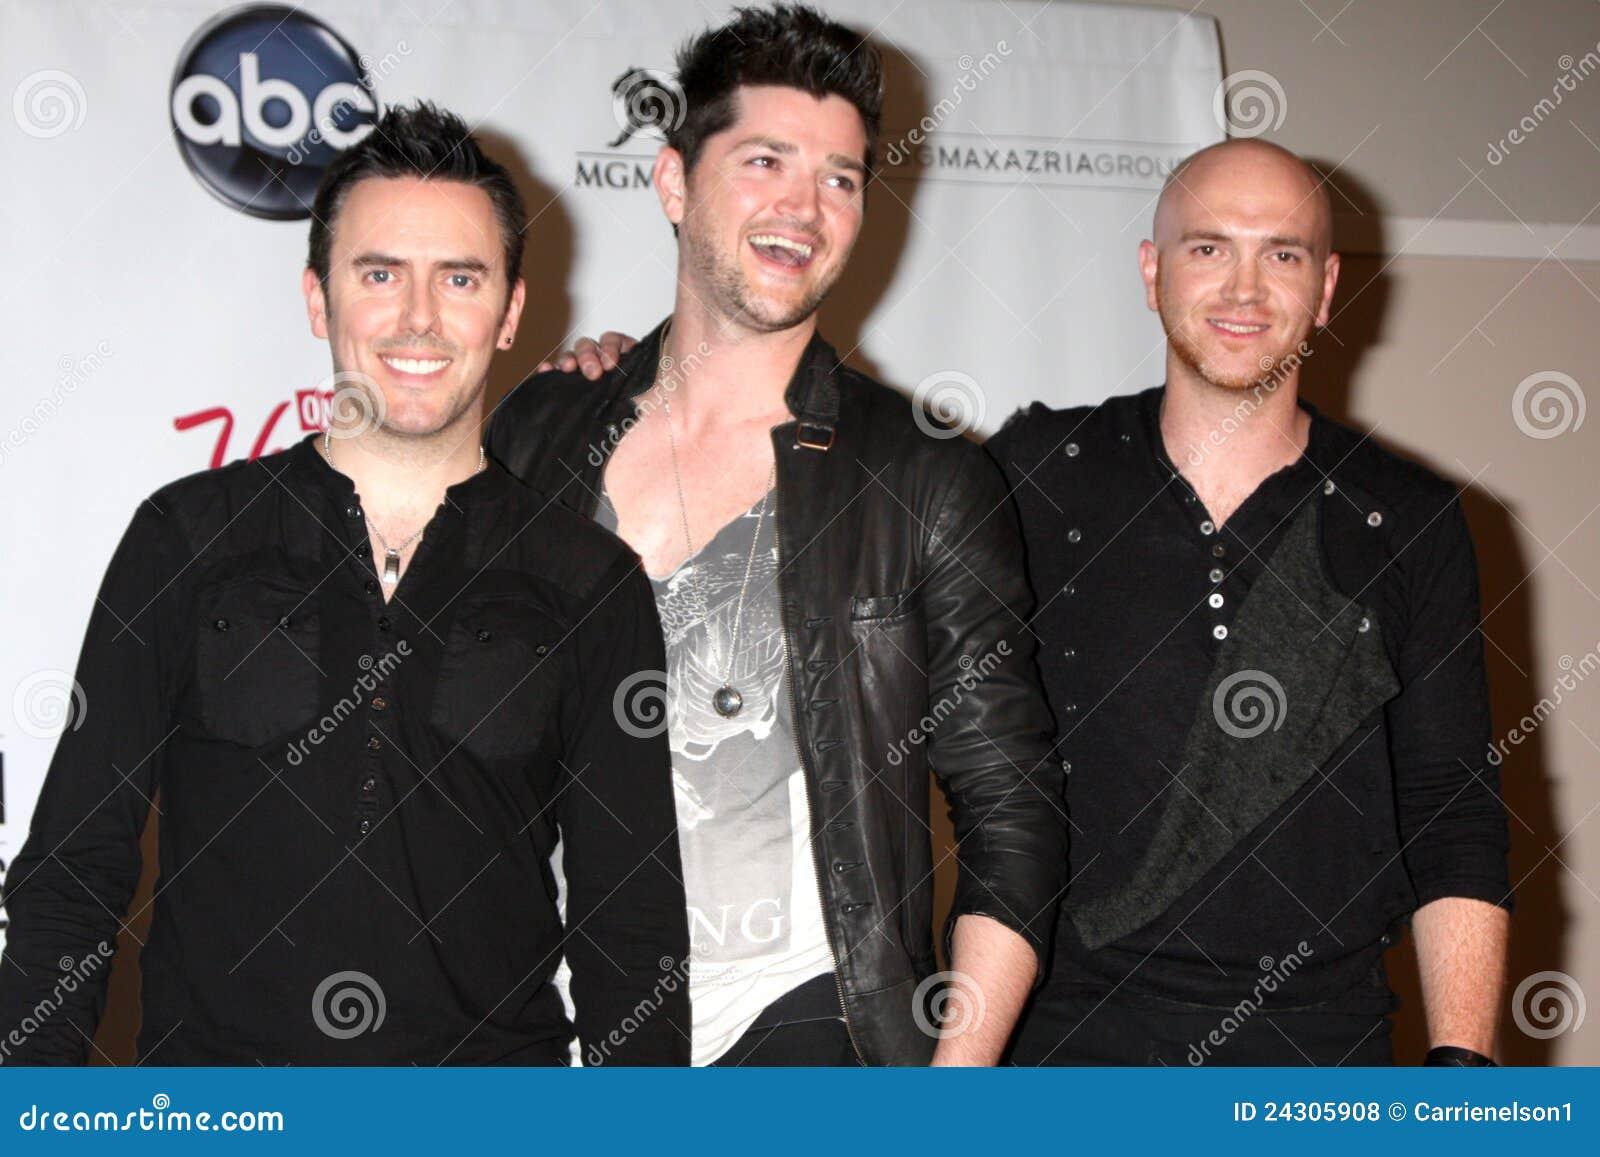 Danny O, Danny o Donoghue